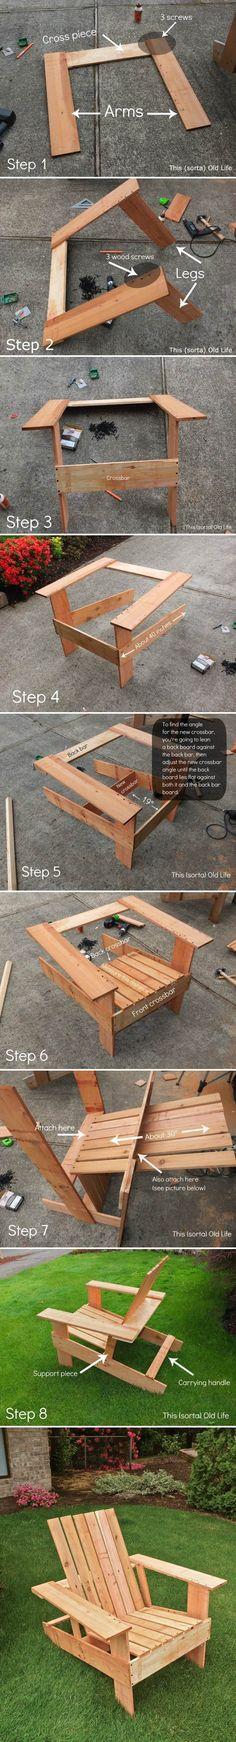 ❧ DIY Adirondack Chair Tutorial: